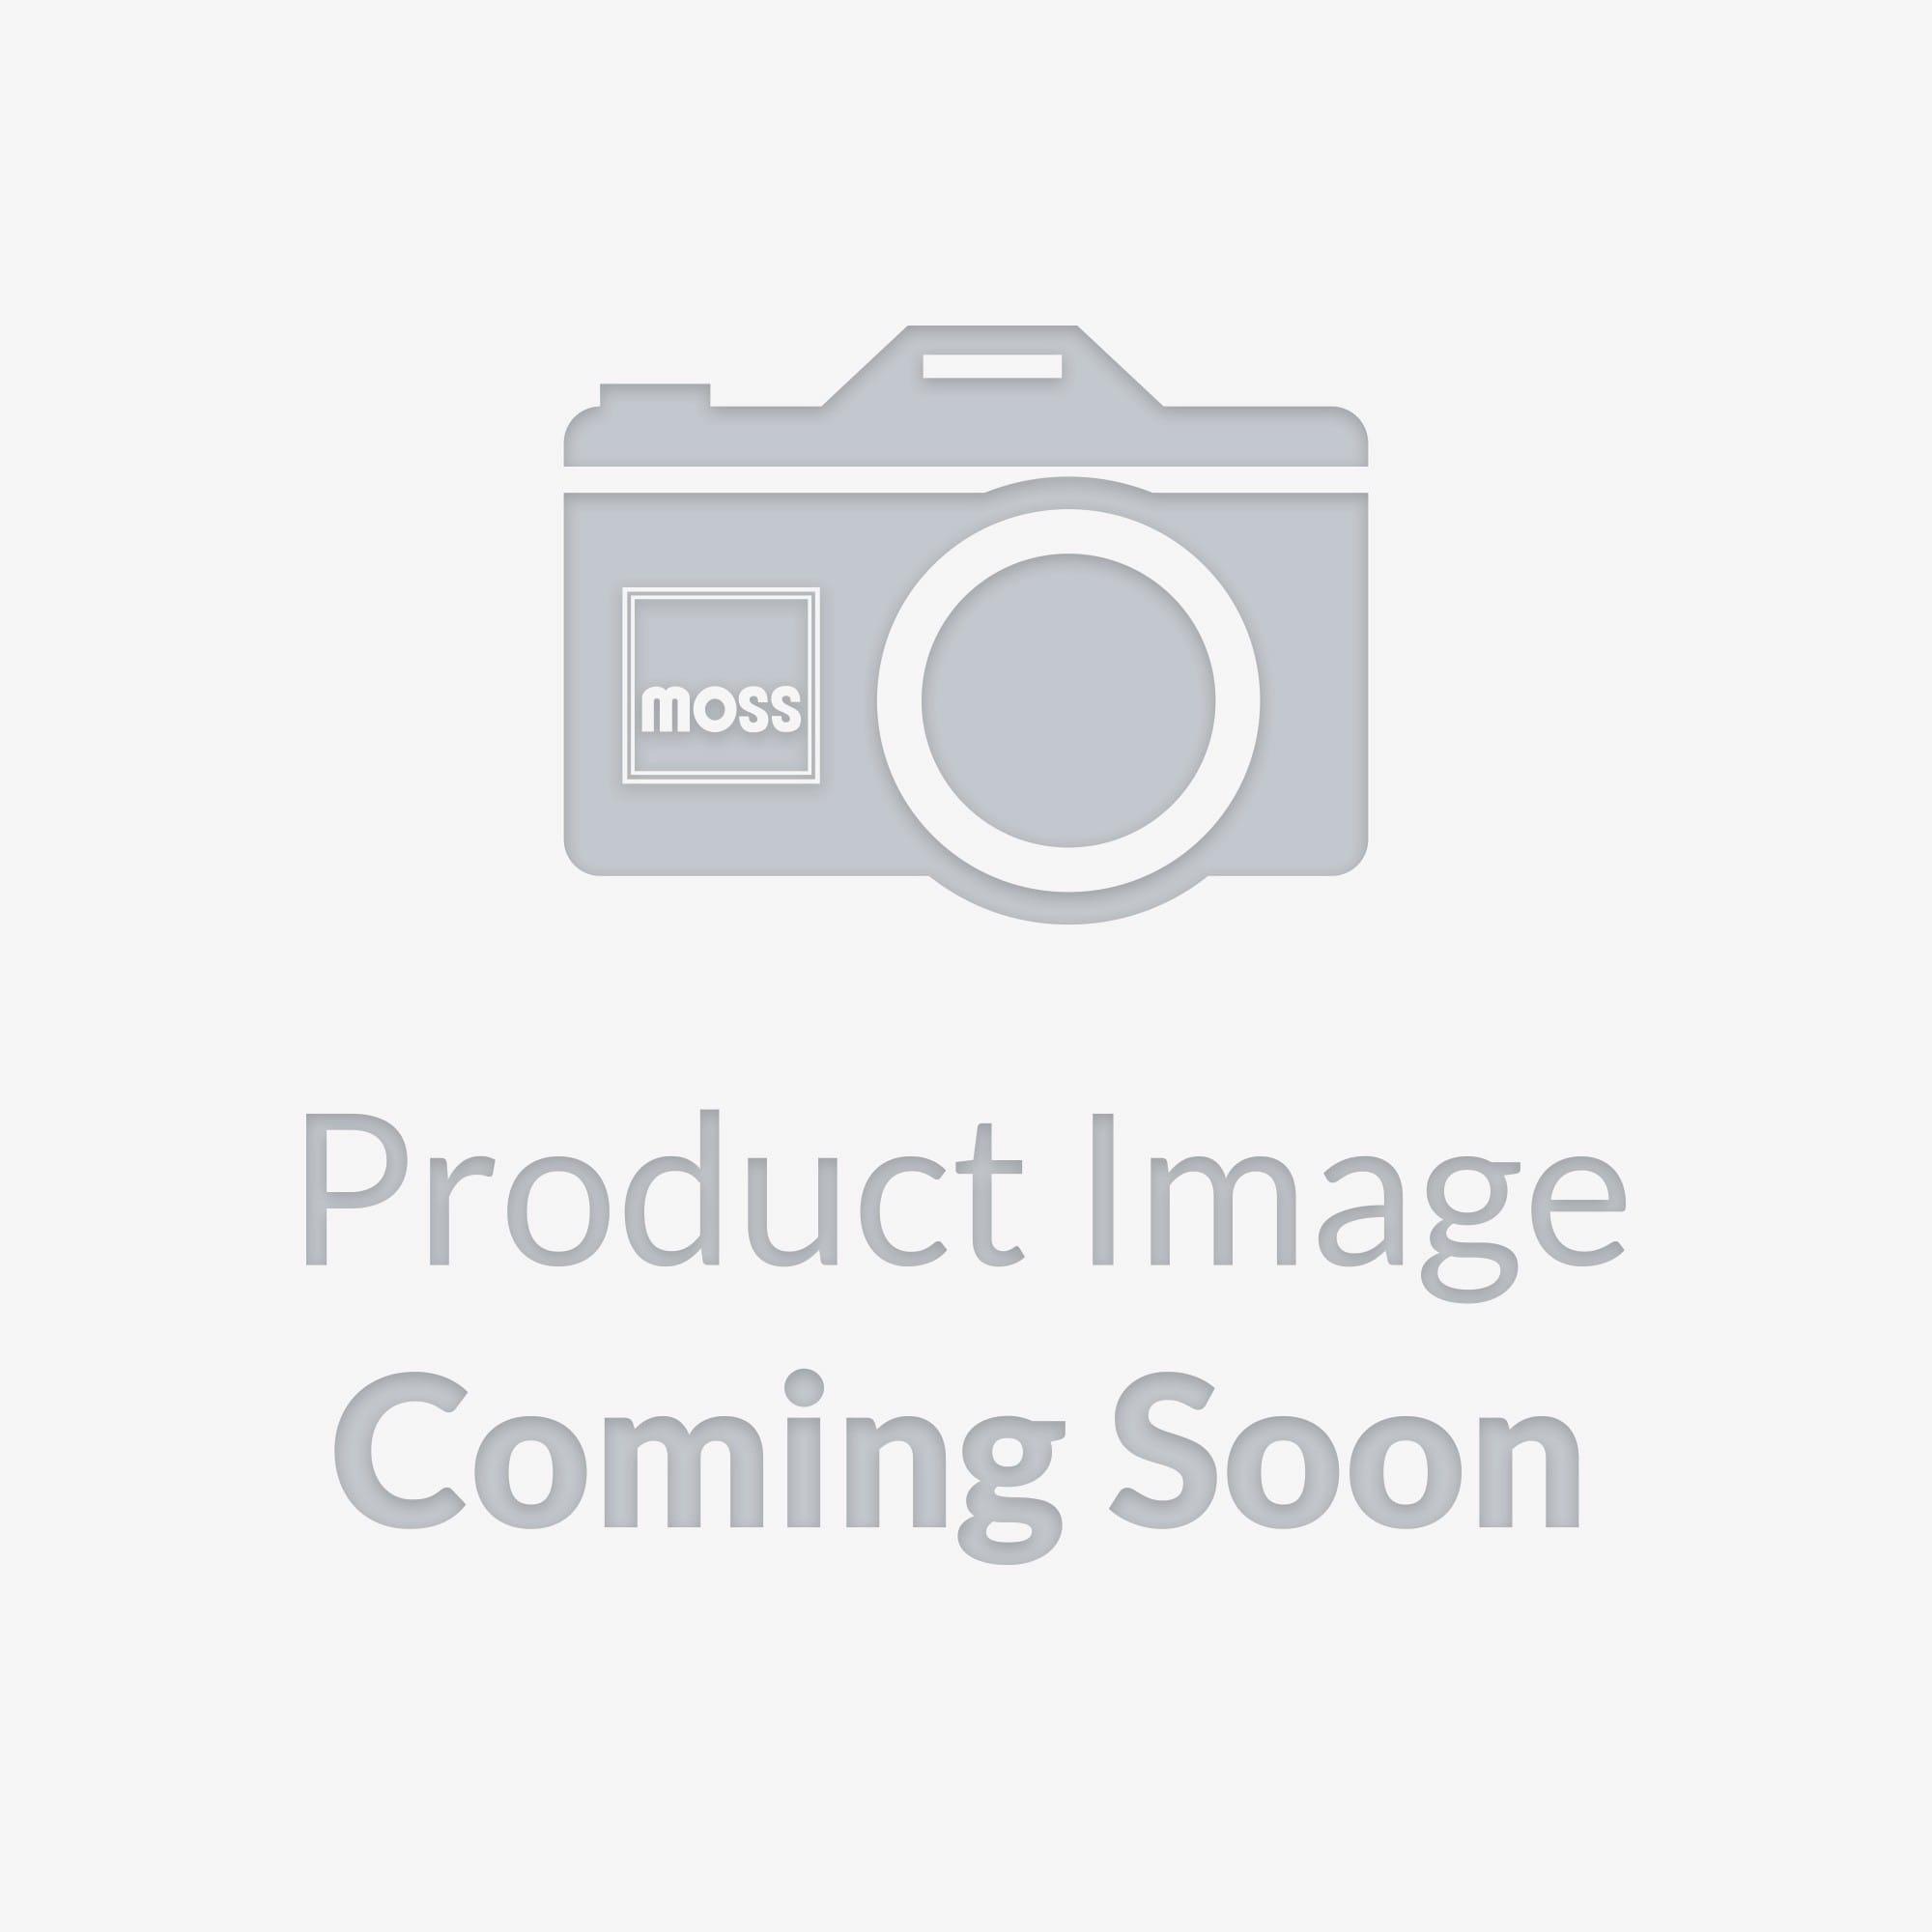 MGB Restoration Parts and Accessories | Moss Motors